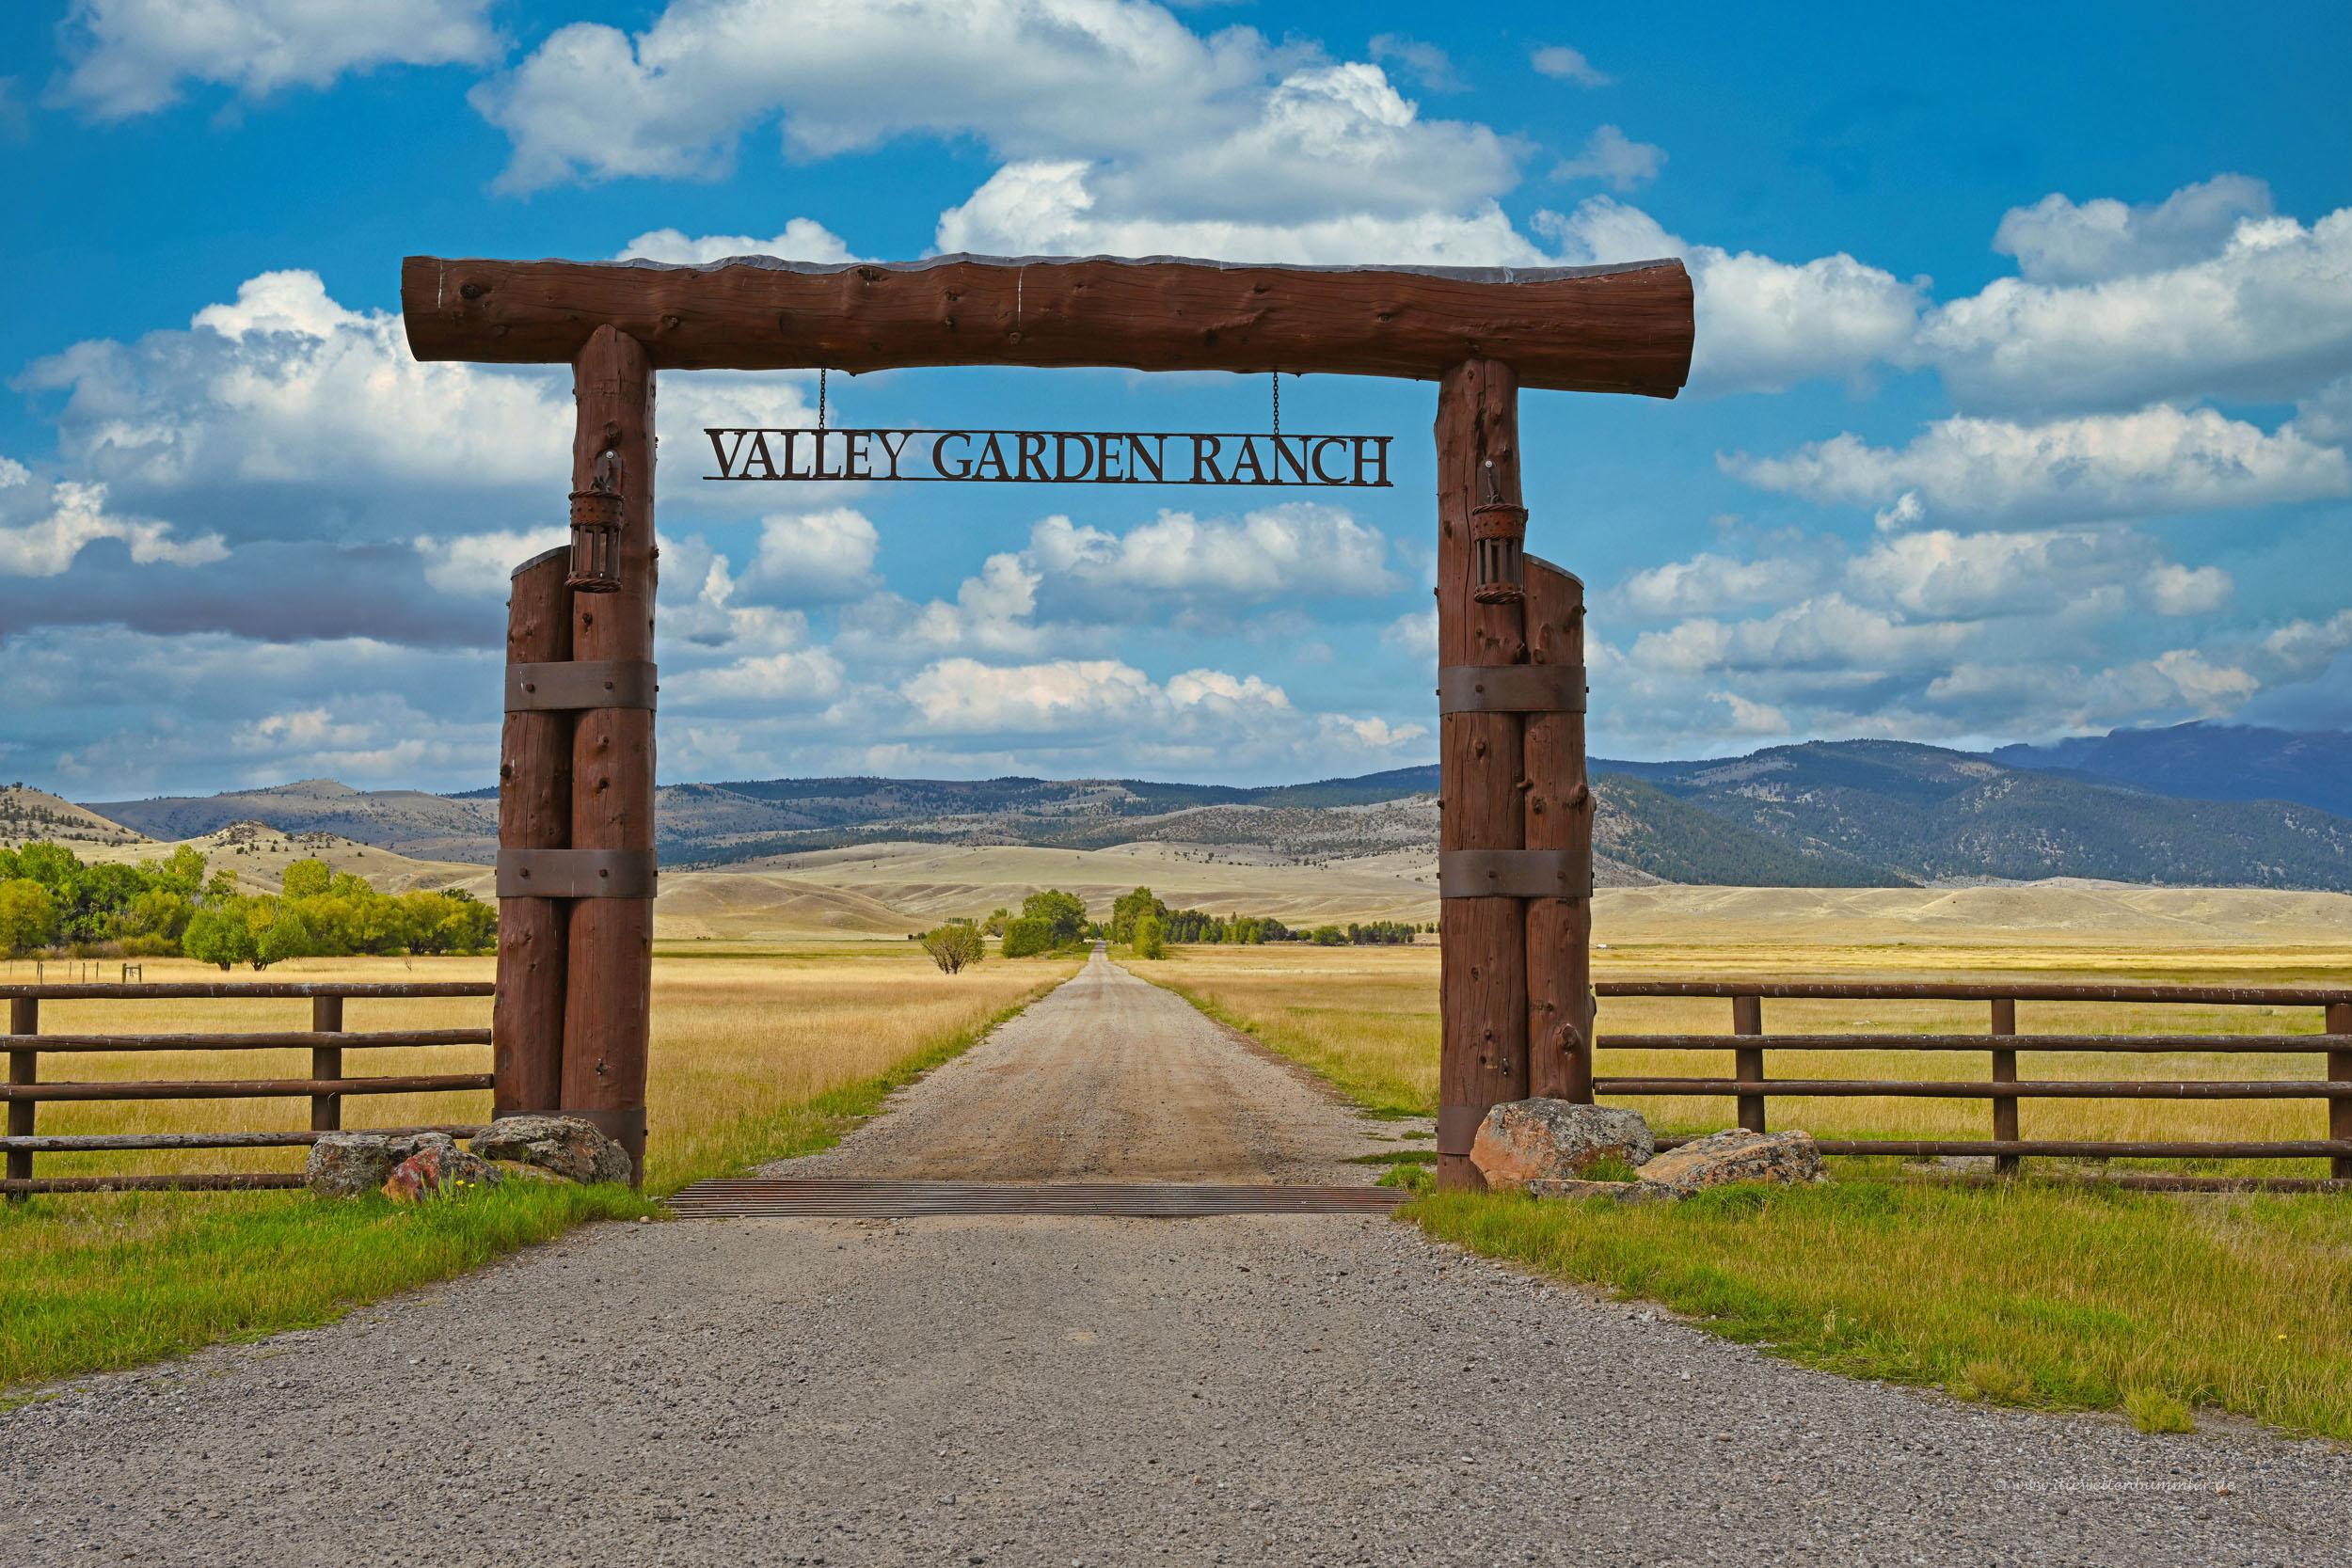 Valley Garden Ranch